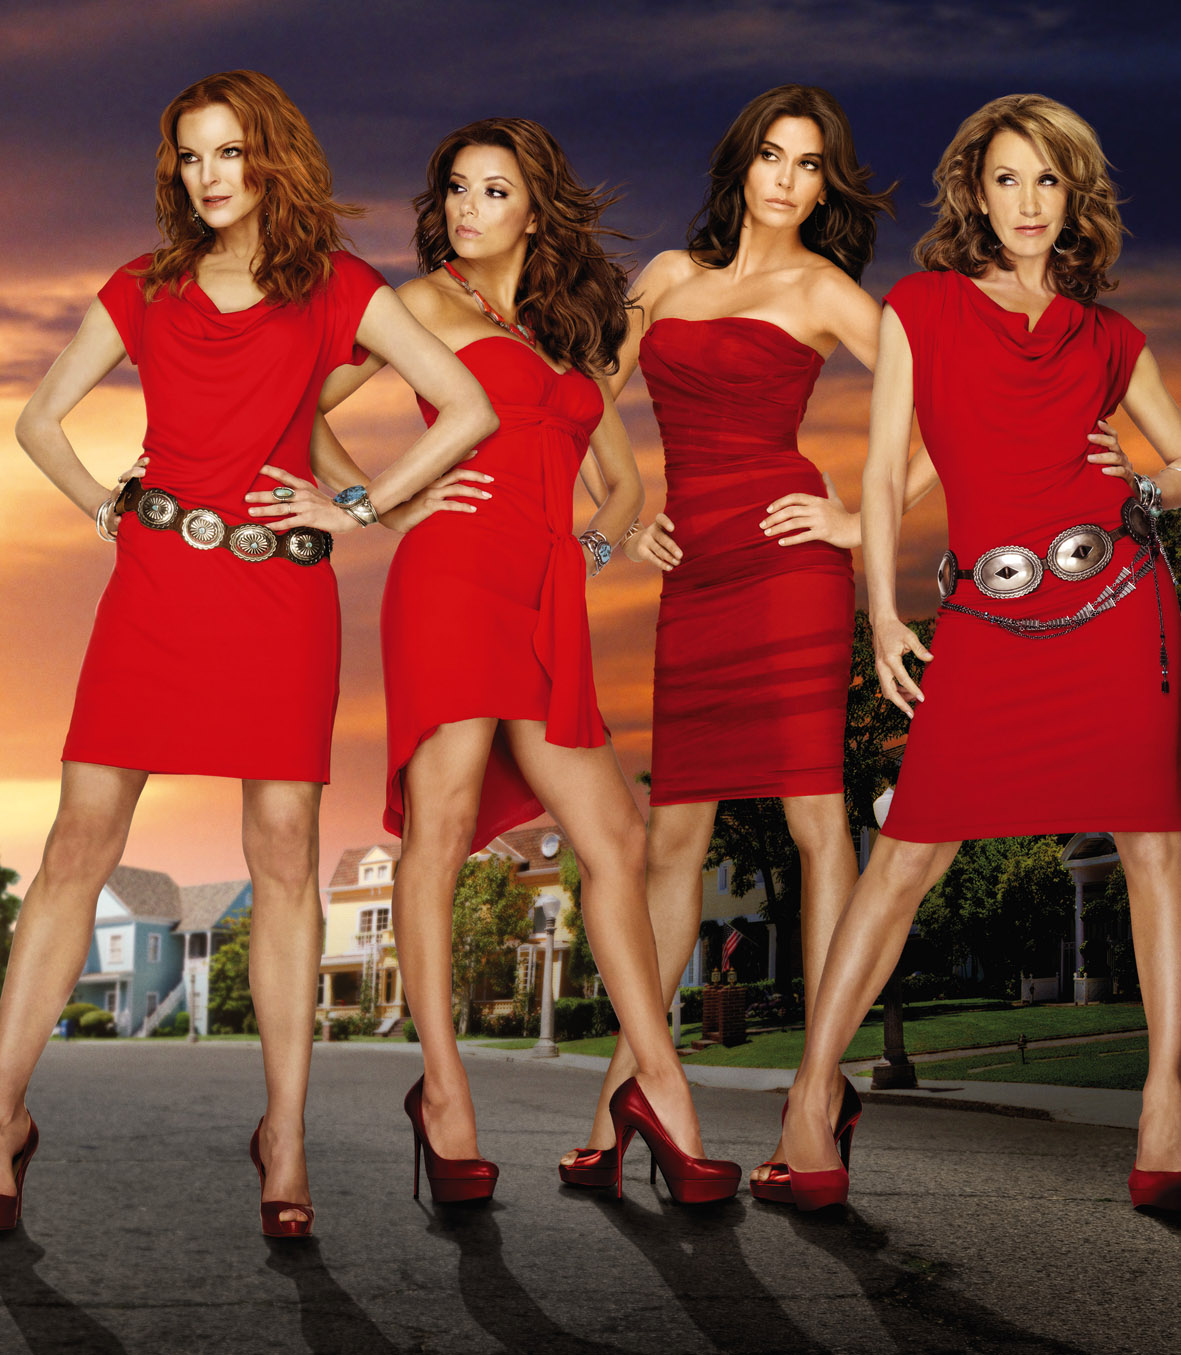 http://3.bp.blogspot.com/-eJozRWp3hc8/TlZe3V-NsxI/AAAAAAAANuM/lF3ZtzpKdus/s1600/housewives.jpg